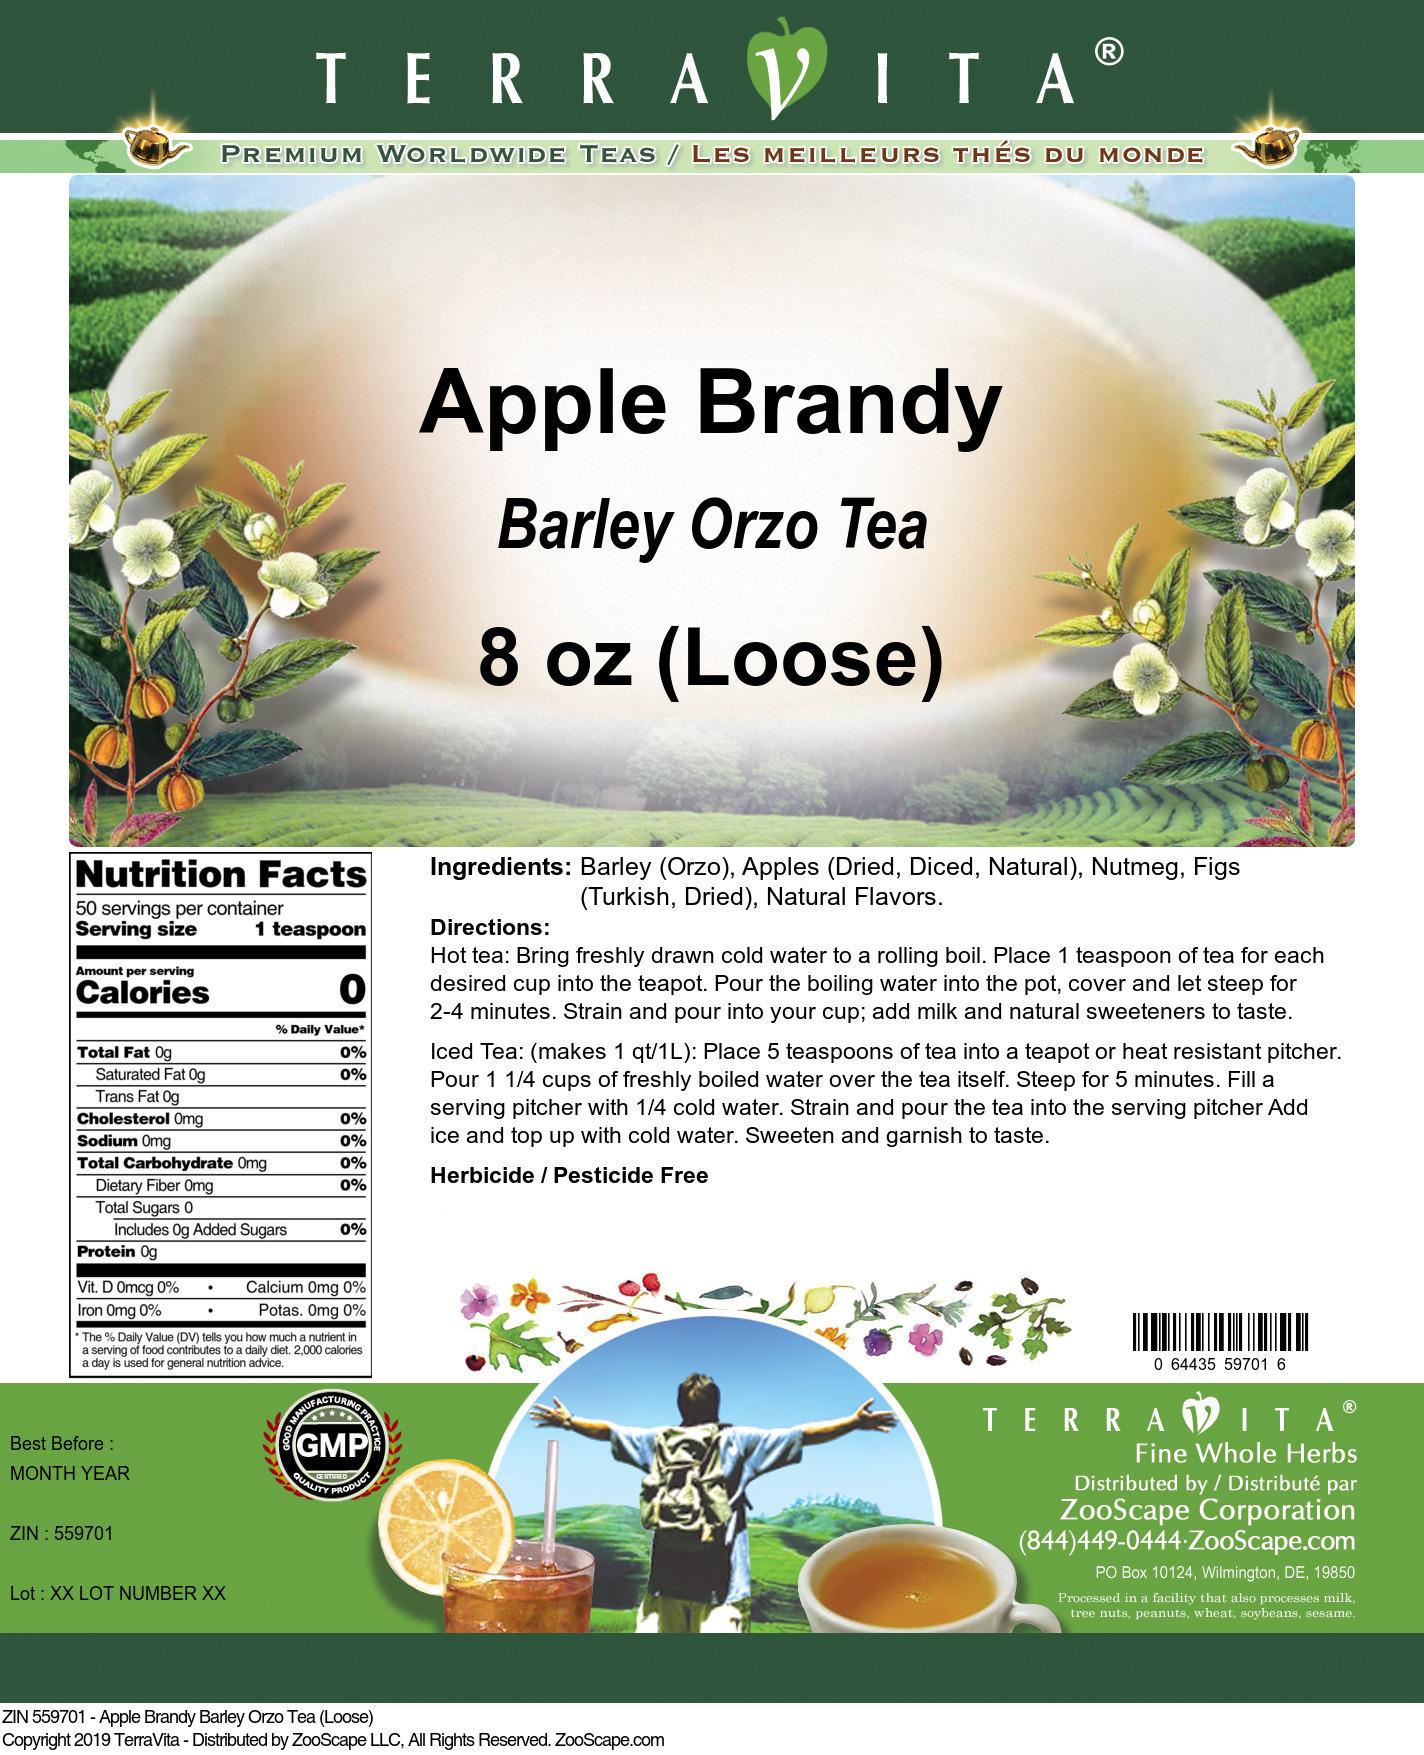 Apple Brandy Barley Orzo Tea (Loose)